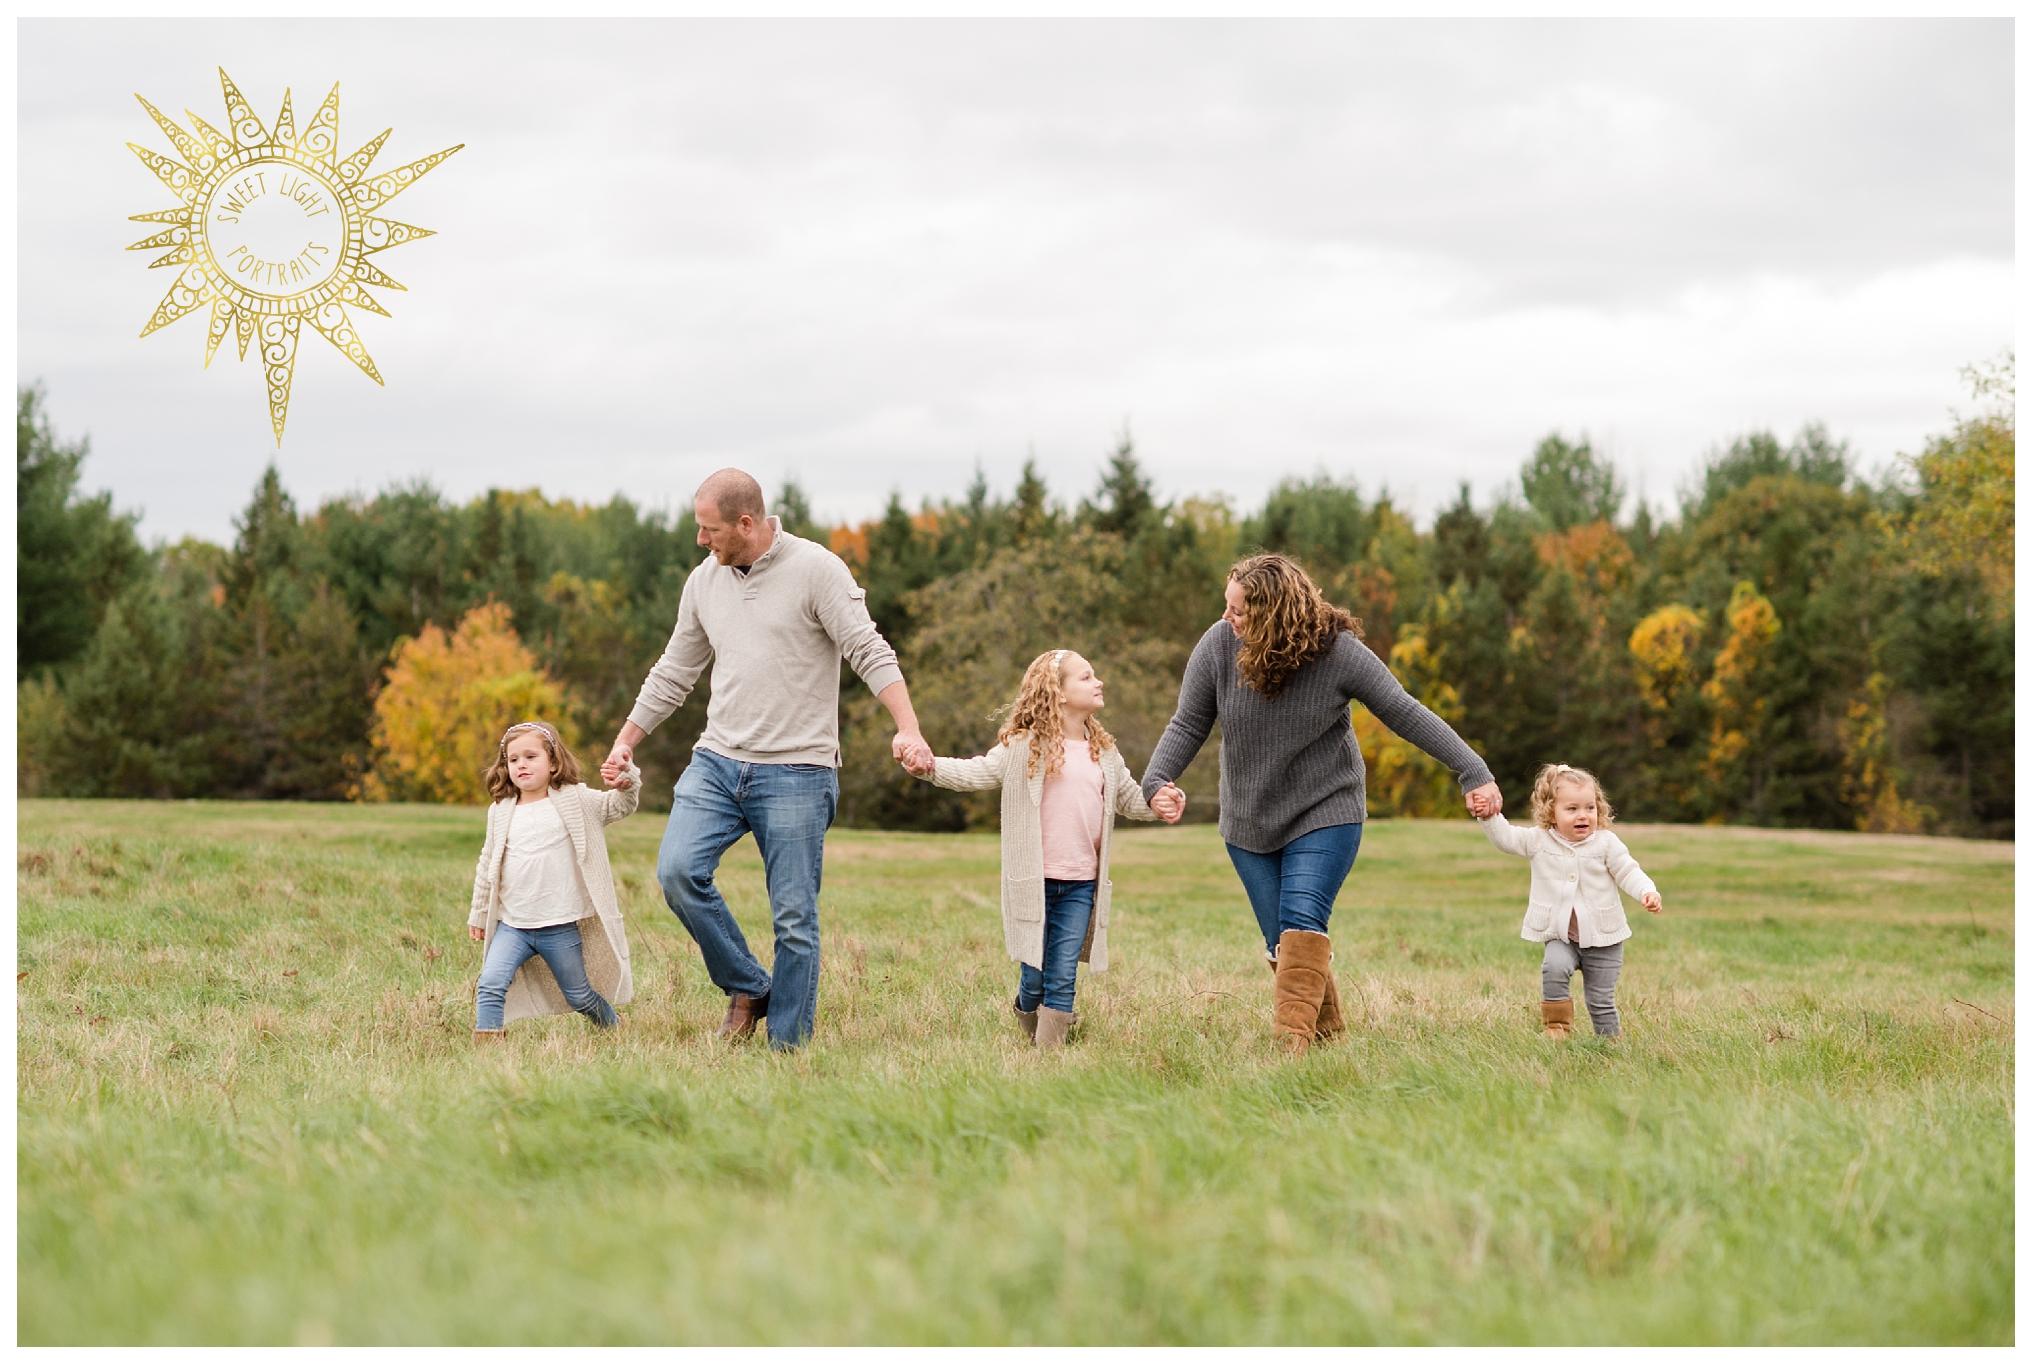 Fall-Family-Photos-Sweet-Light-Portraits06.jpg